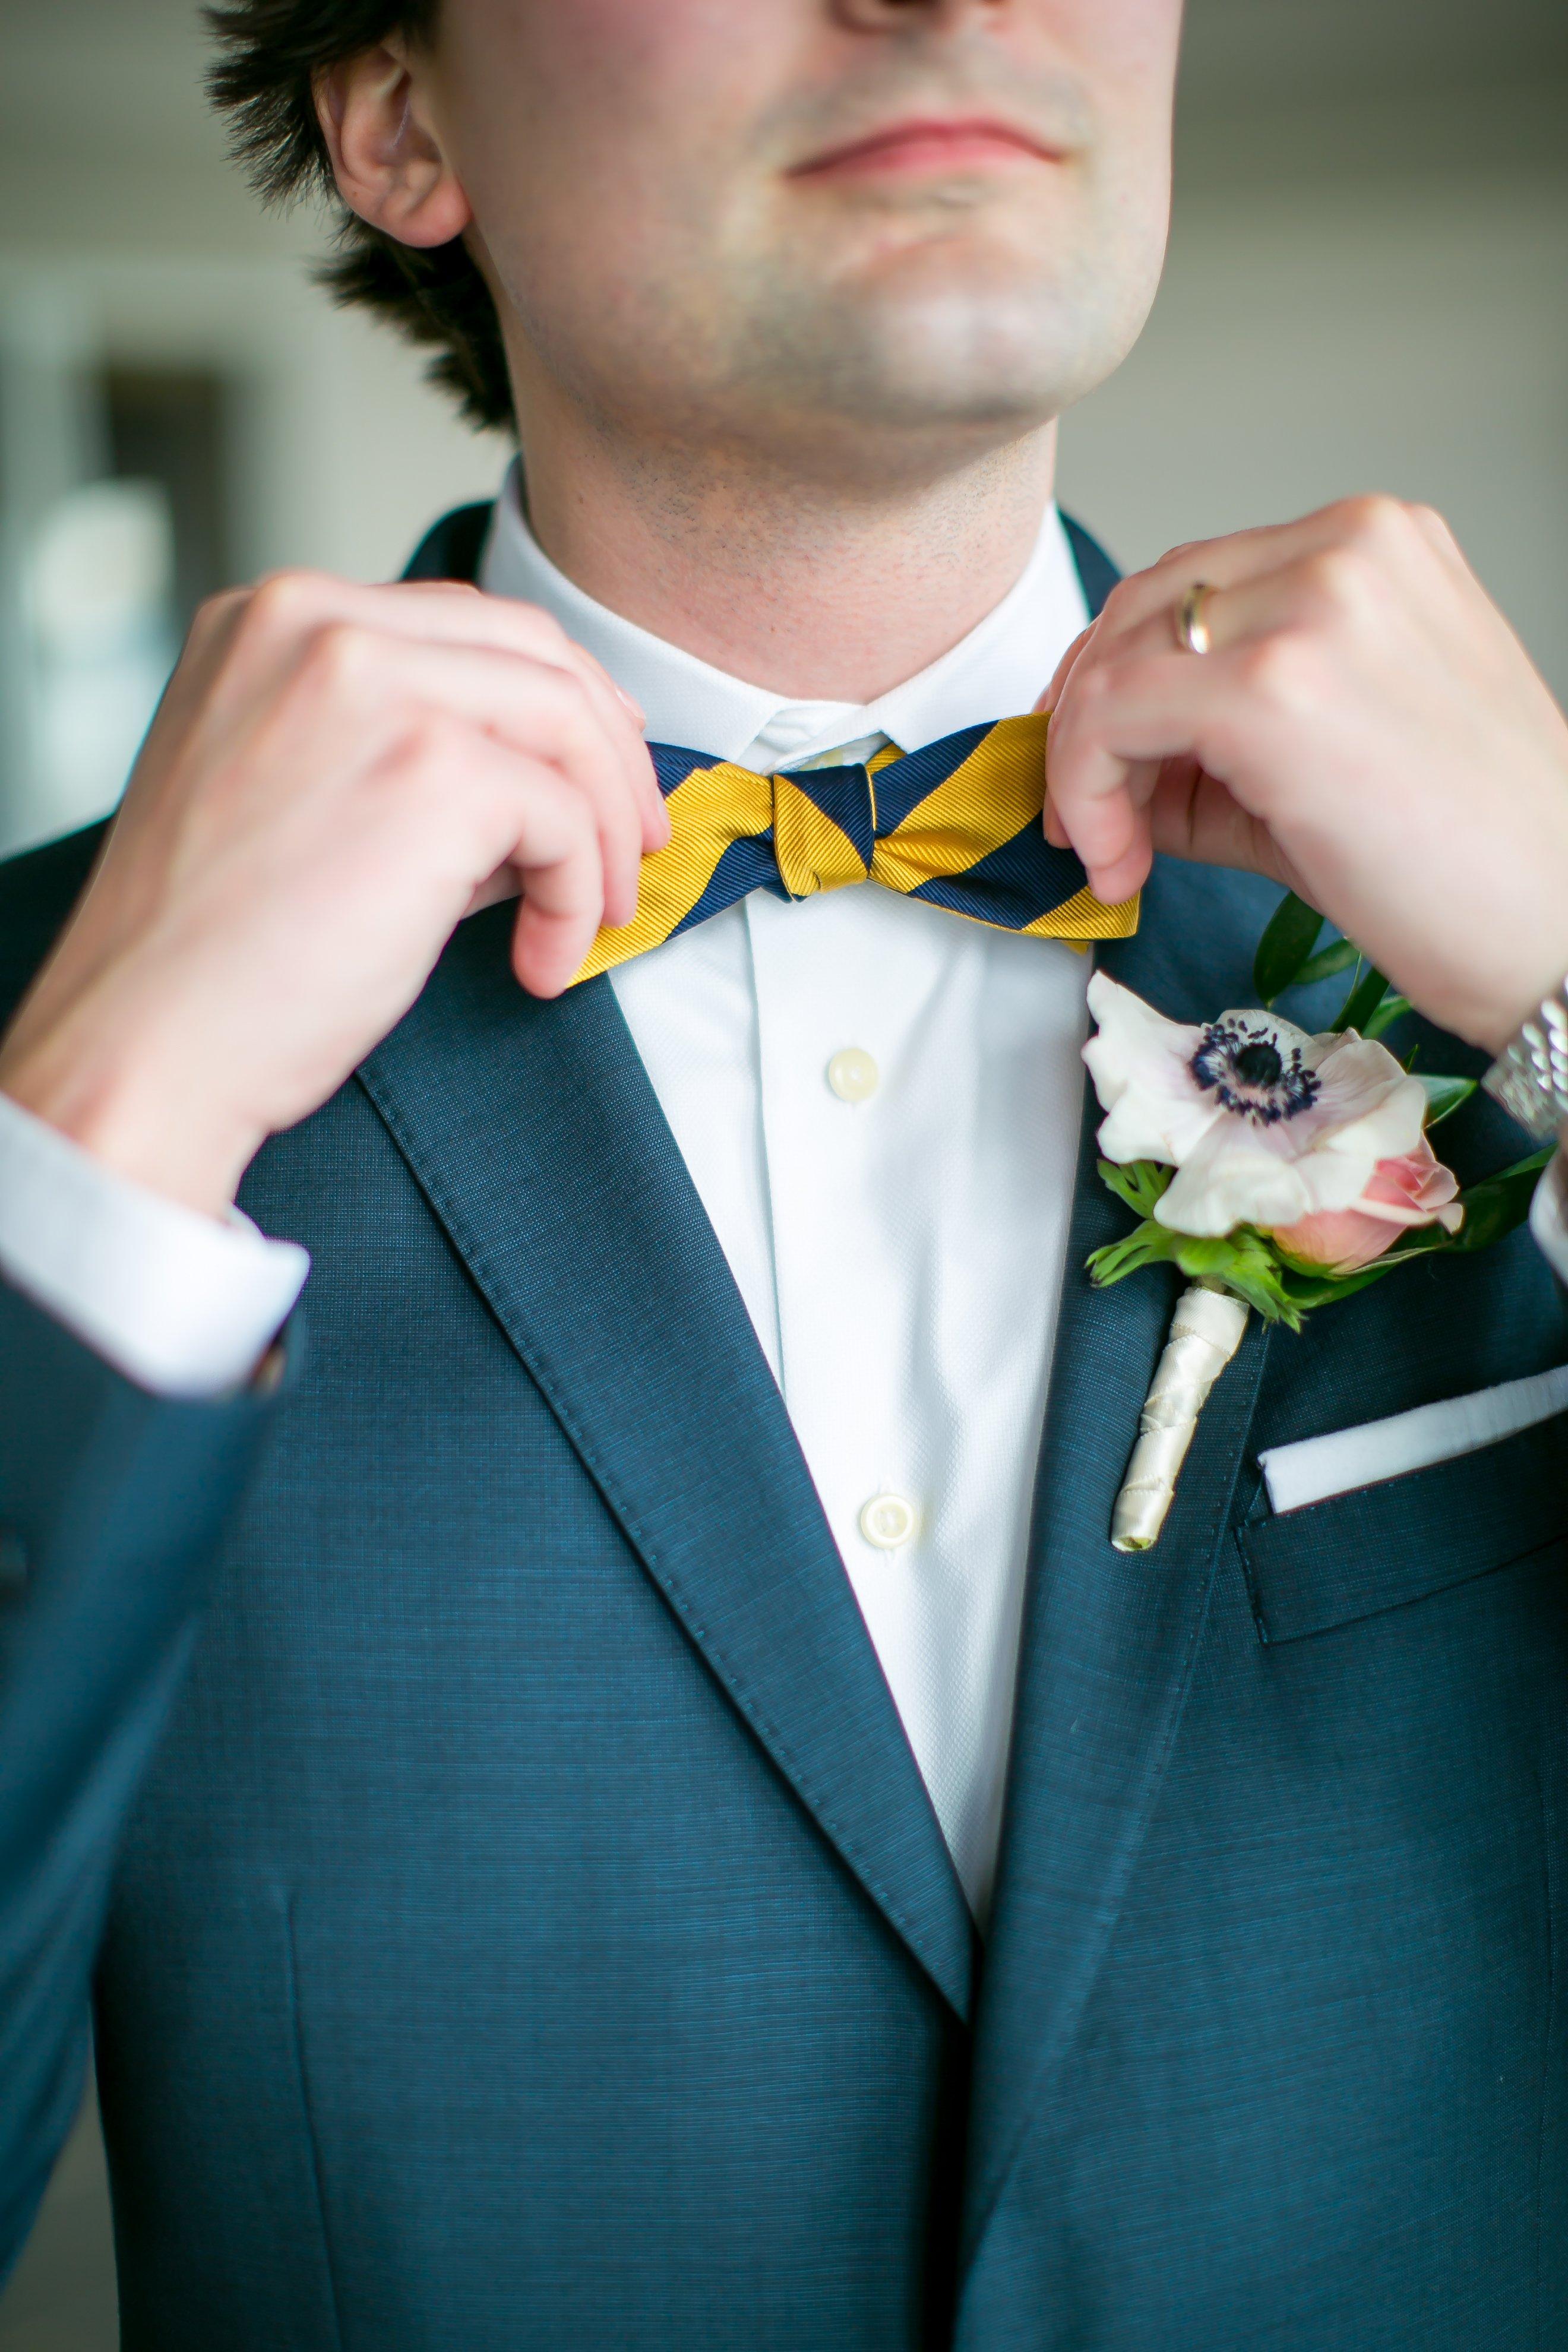 Blue-Suit-Wedding-Trend-Virginia-Beach-Lesner-Inn-David-Champagne-Photography.jpg